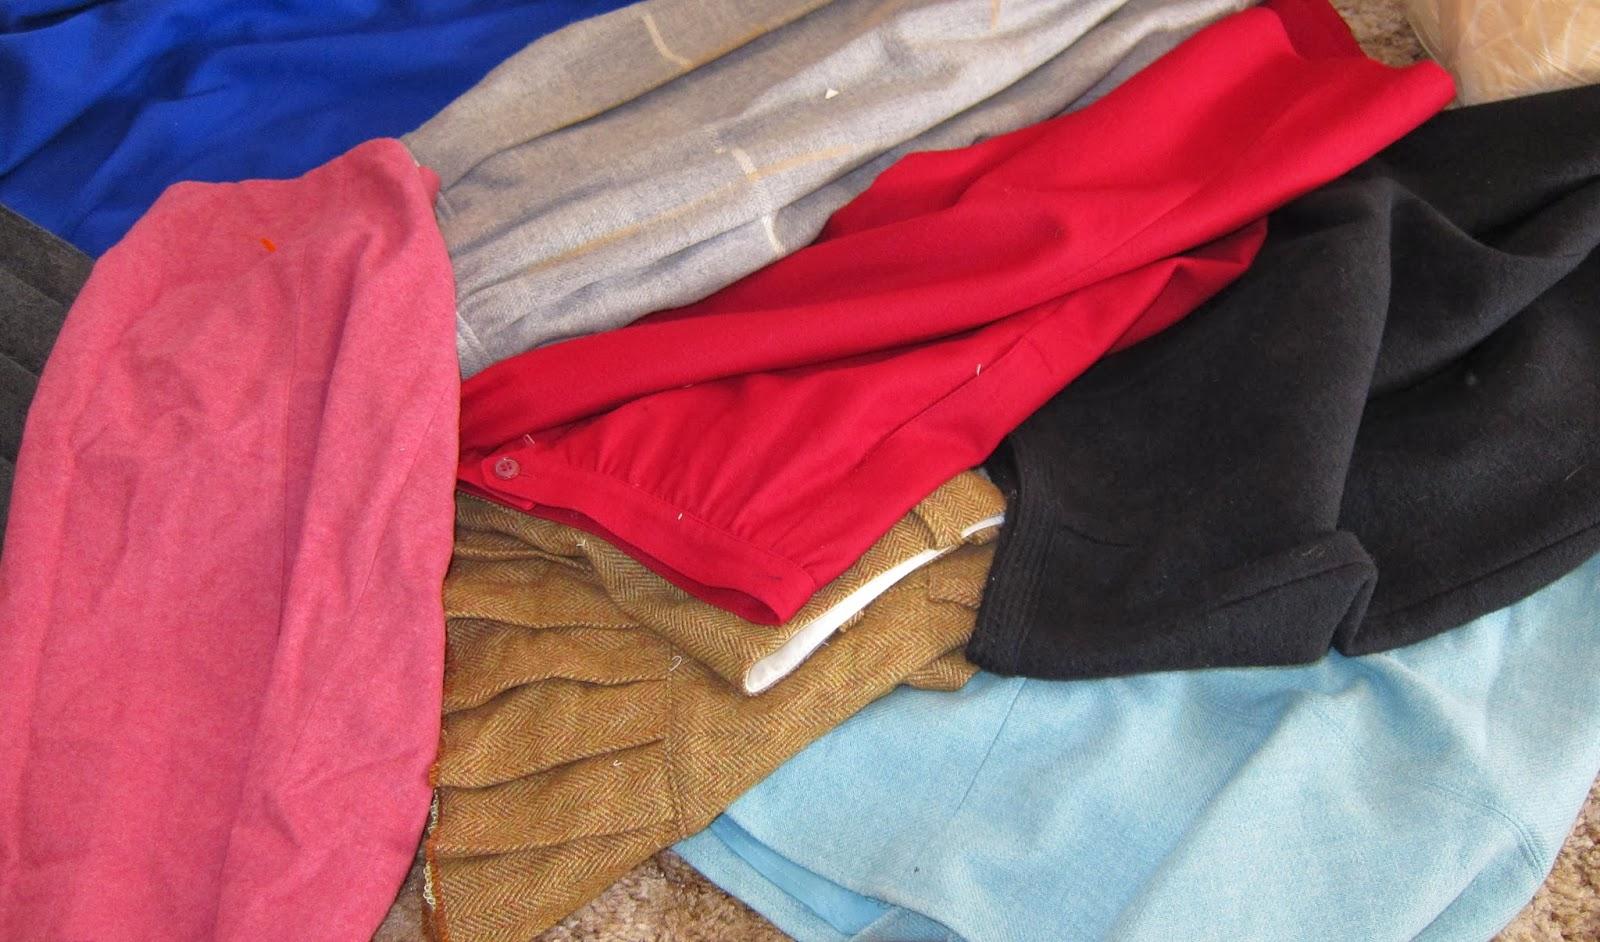 Felt Fabric Uses Felt And Use in Wool